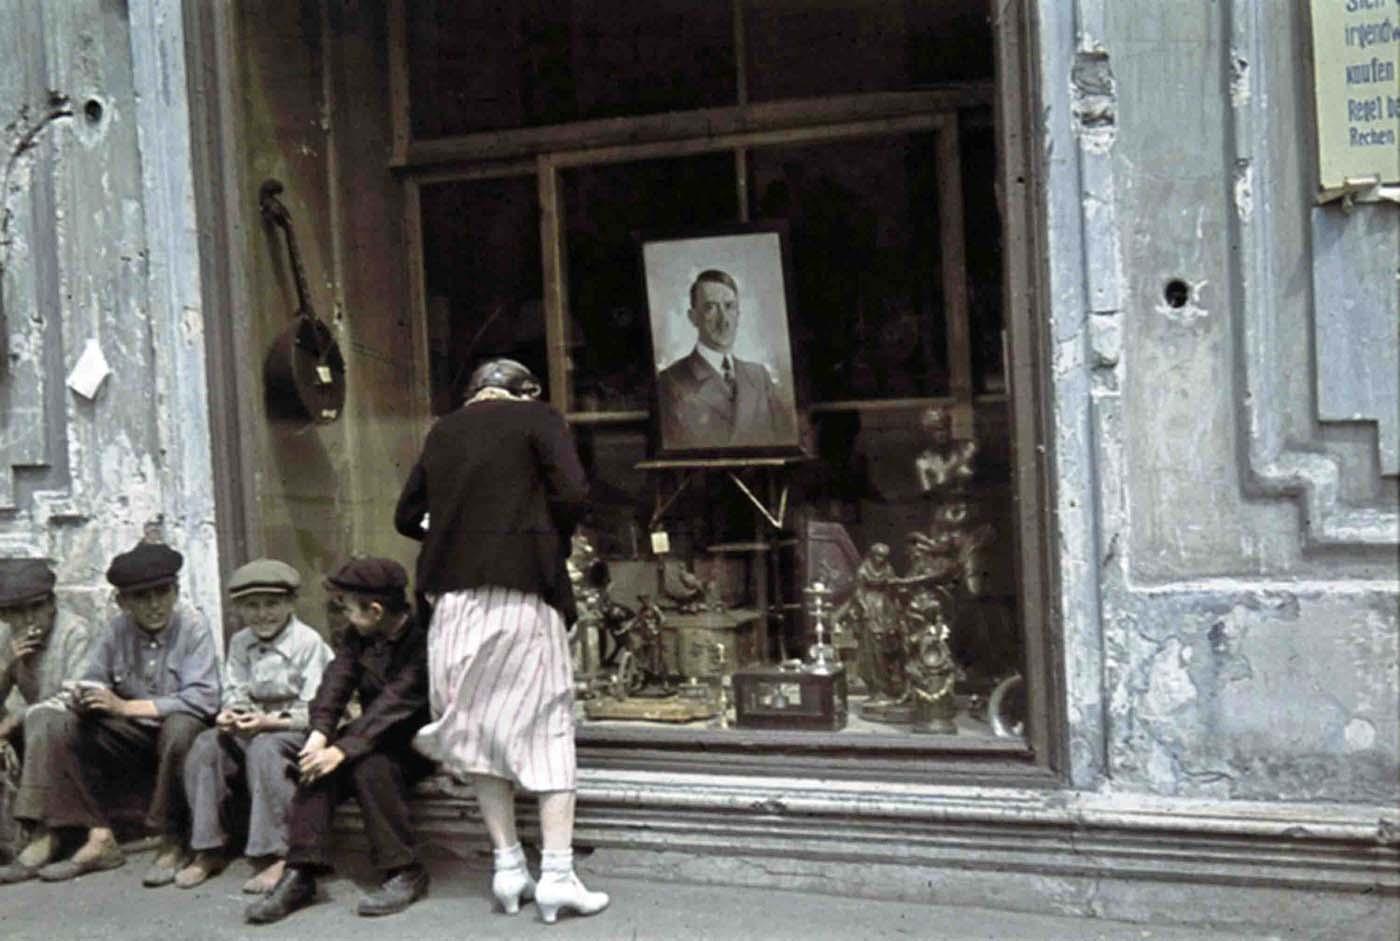 Retrato de Adolf Hitler en un escaparate.